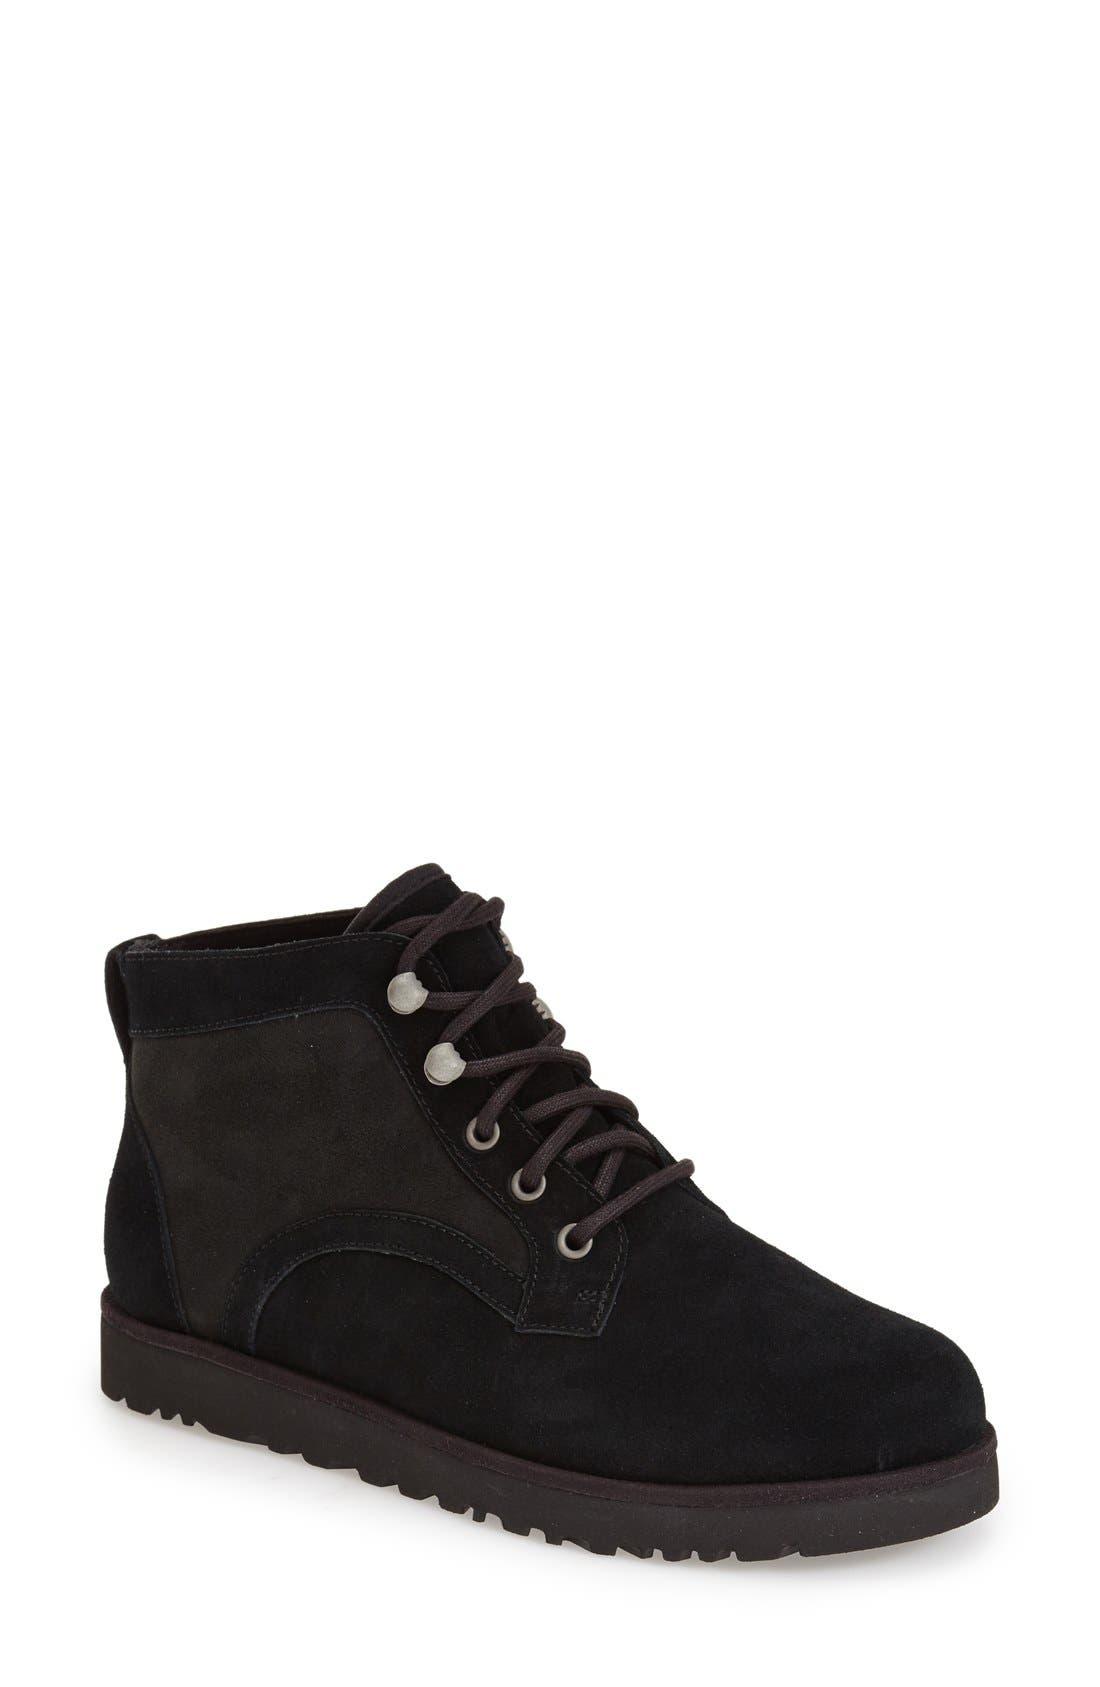 Main Image - UGG® Bethany - Classic Slim™ Water Resistant Chukka Boot (Women)